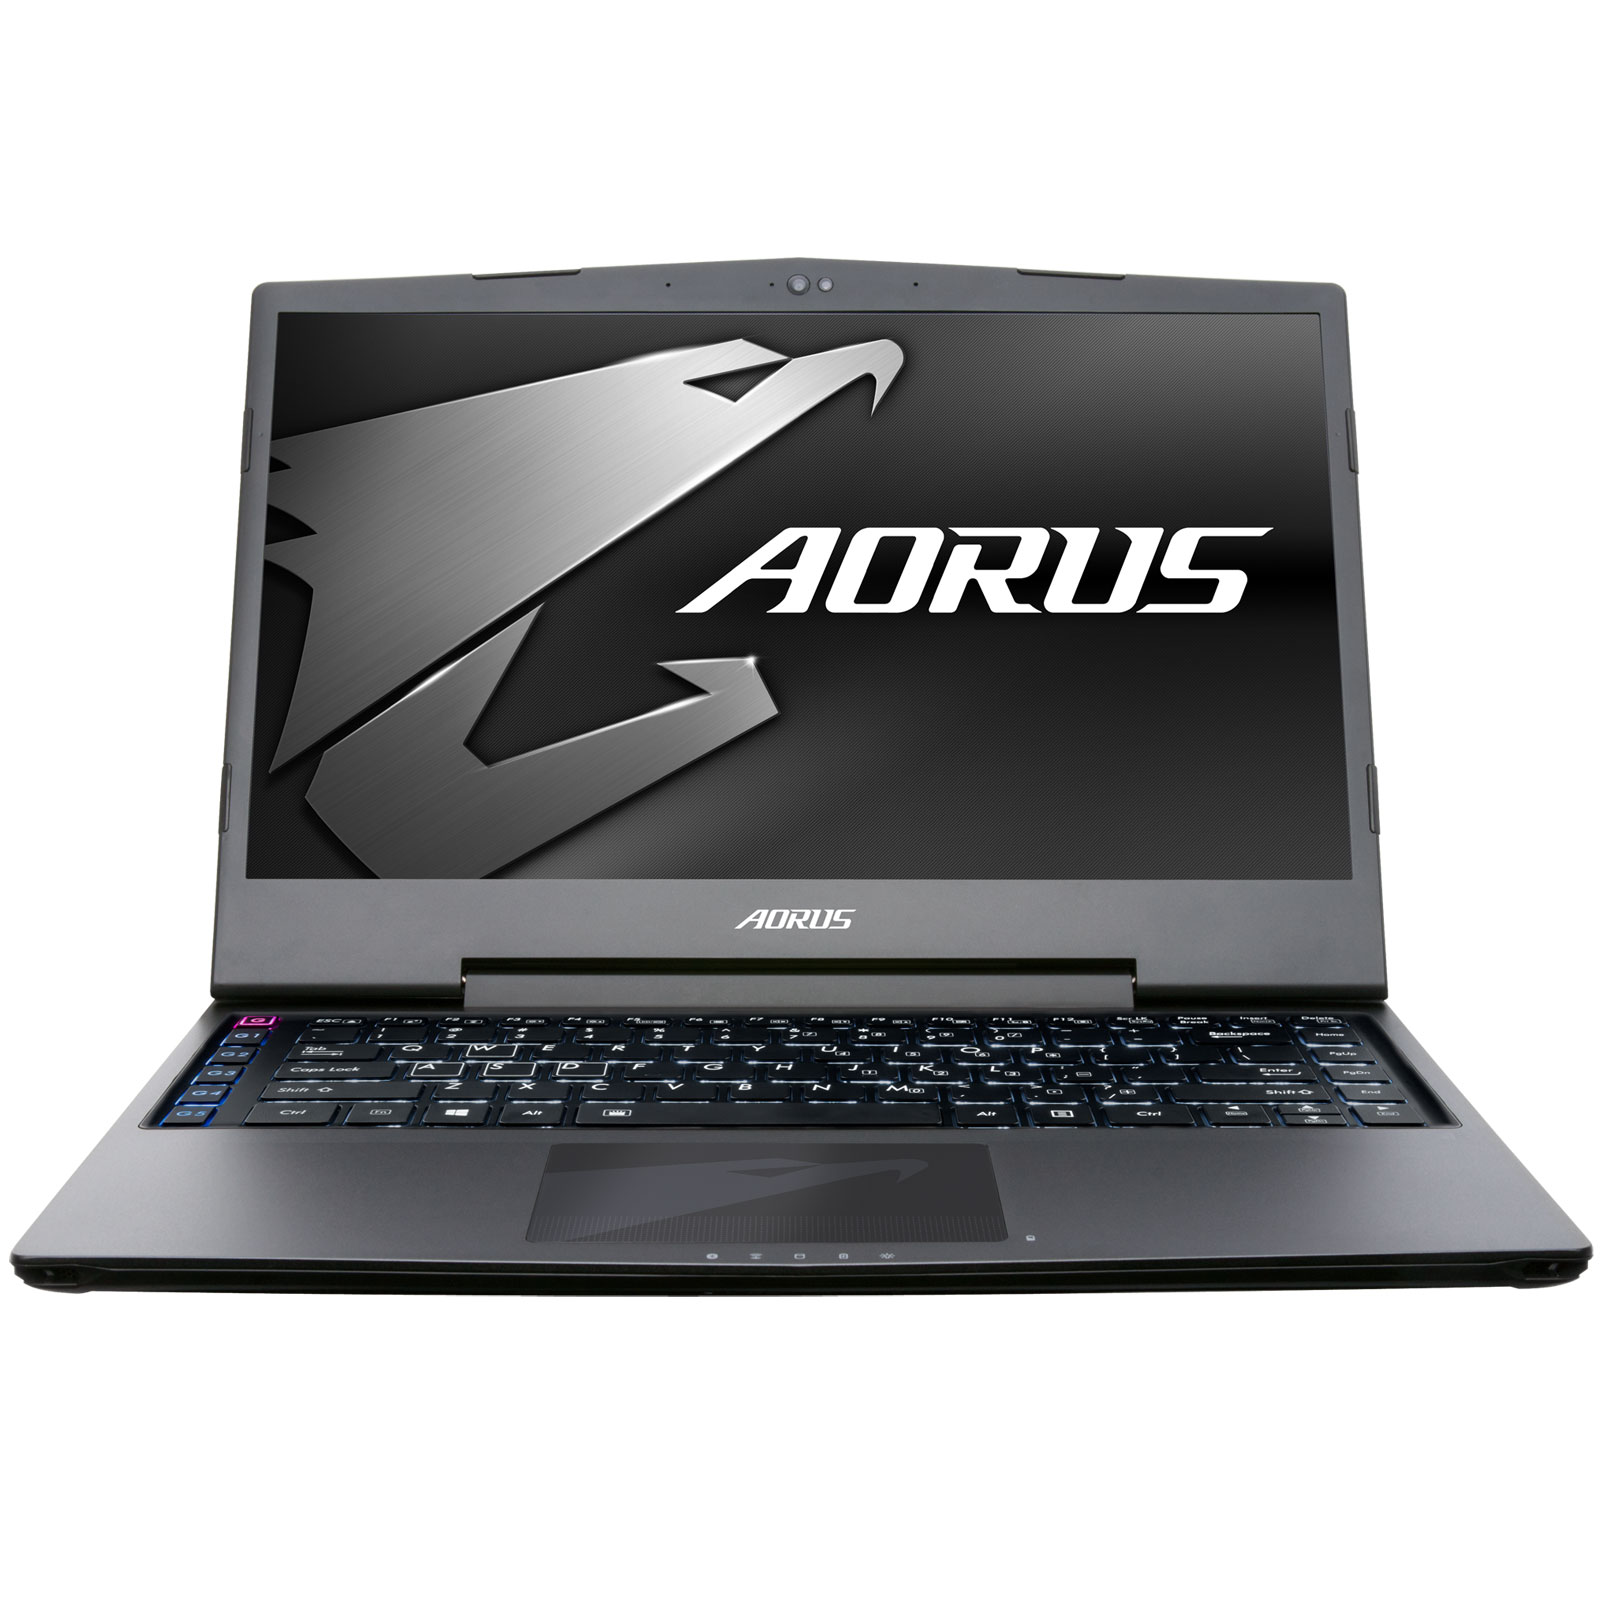 "PC portable AORUS X3 Plus v6 K1NW10-FR Intel Core i7-6820HK 16 Go SSD 512 Go 13.9"" LED QHD+ NVIDIA GeForce GTX 1060 Wi-Fi AC/Bluetooth Webcam Windows 10 Famille 64 bits"